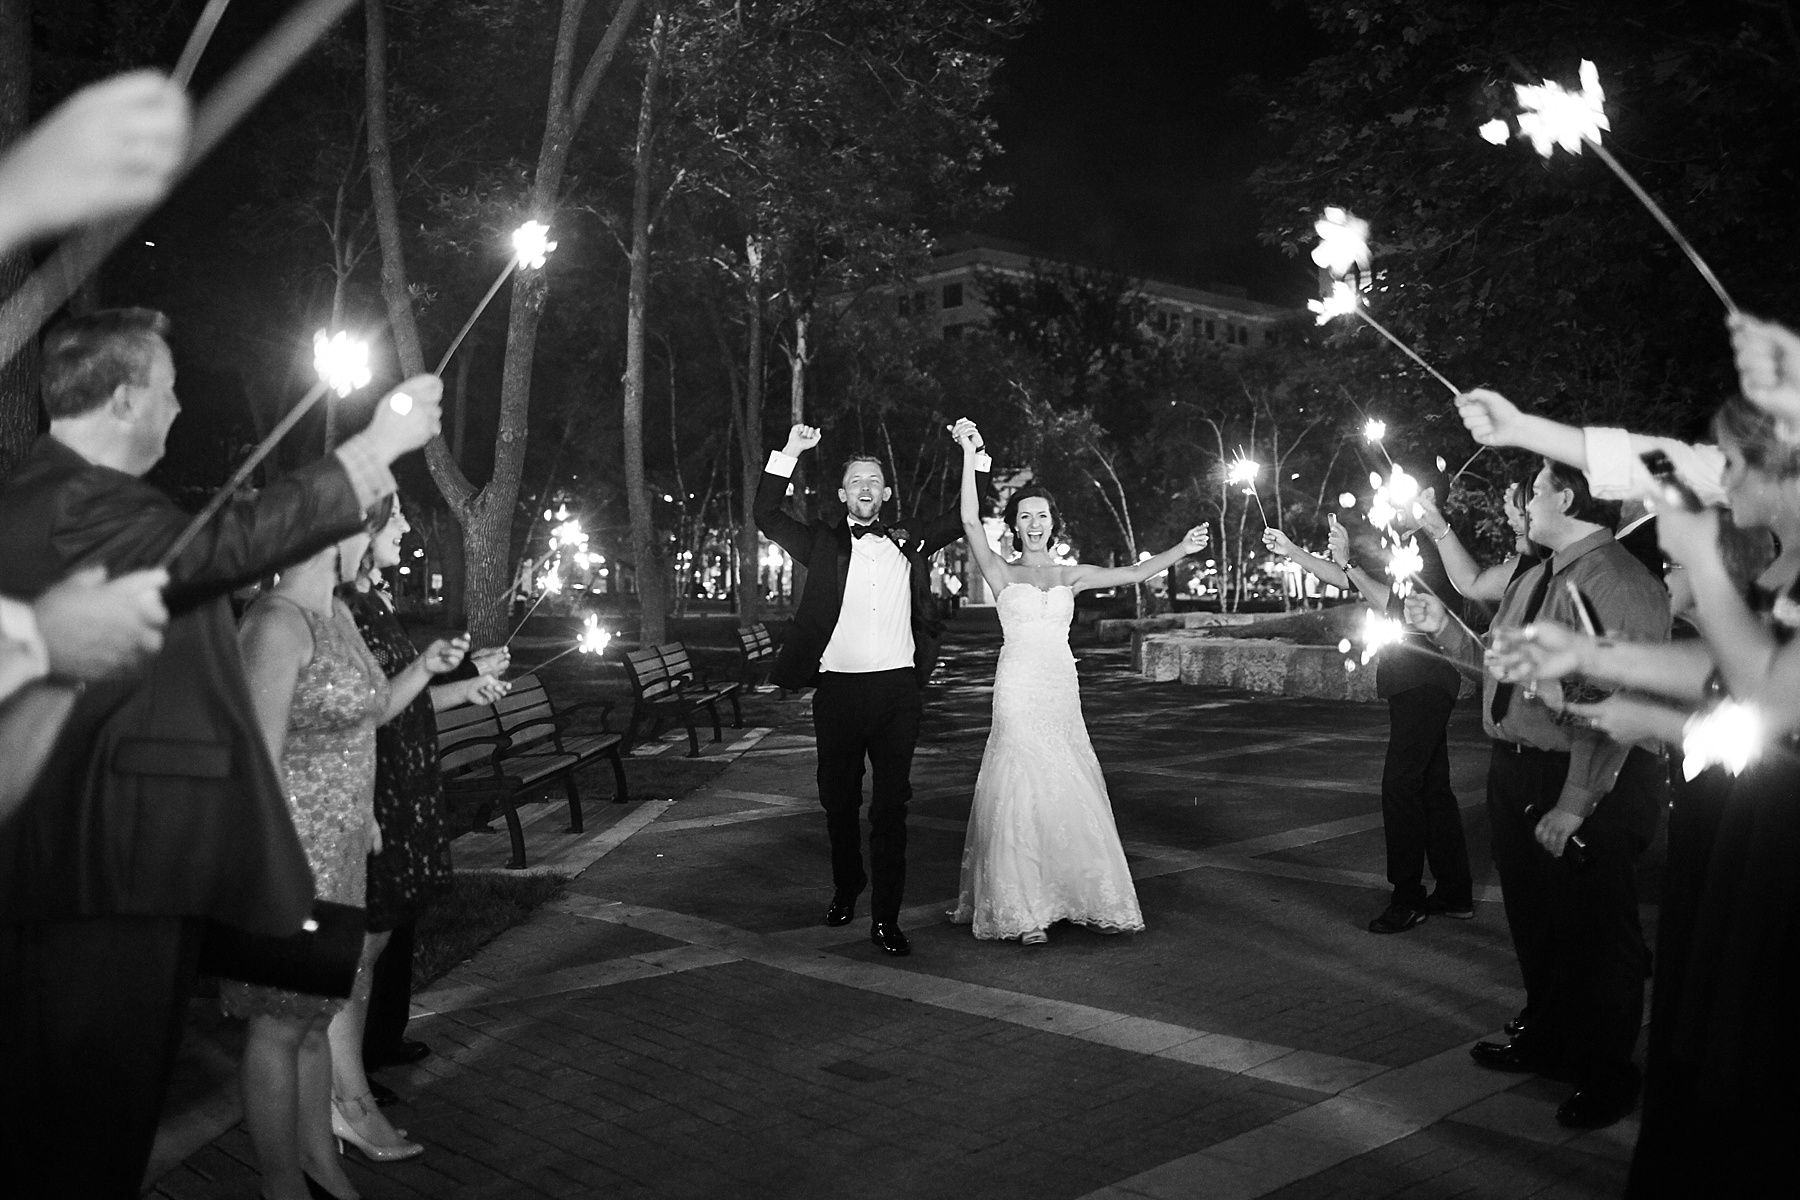 ABULAE-Wedding-Saint-paul-MN-Josh-Sofia-Wedding-Mears-Park_0873.jpg